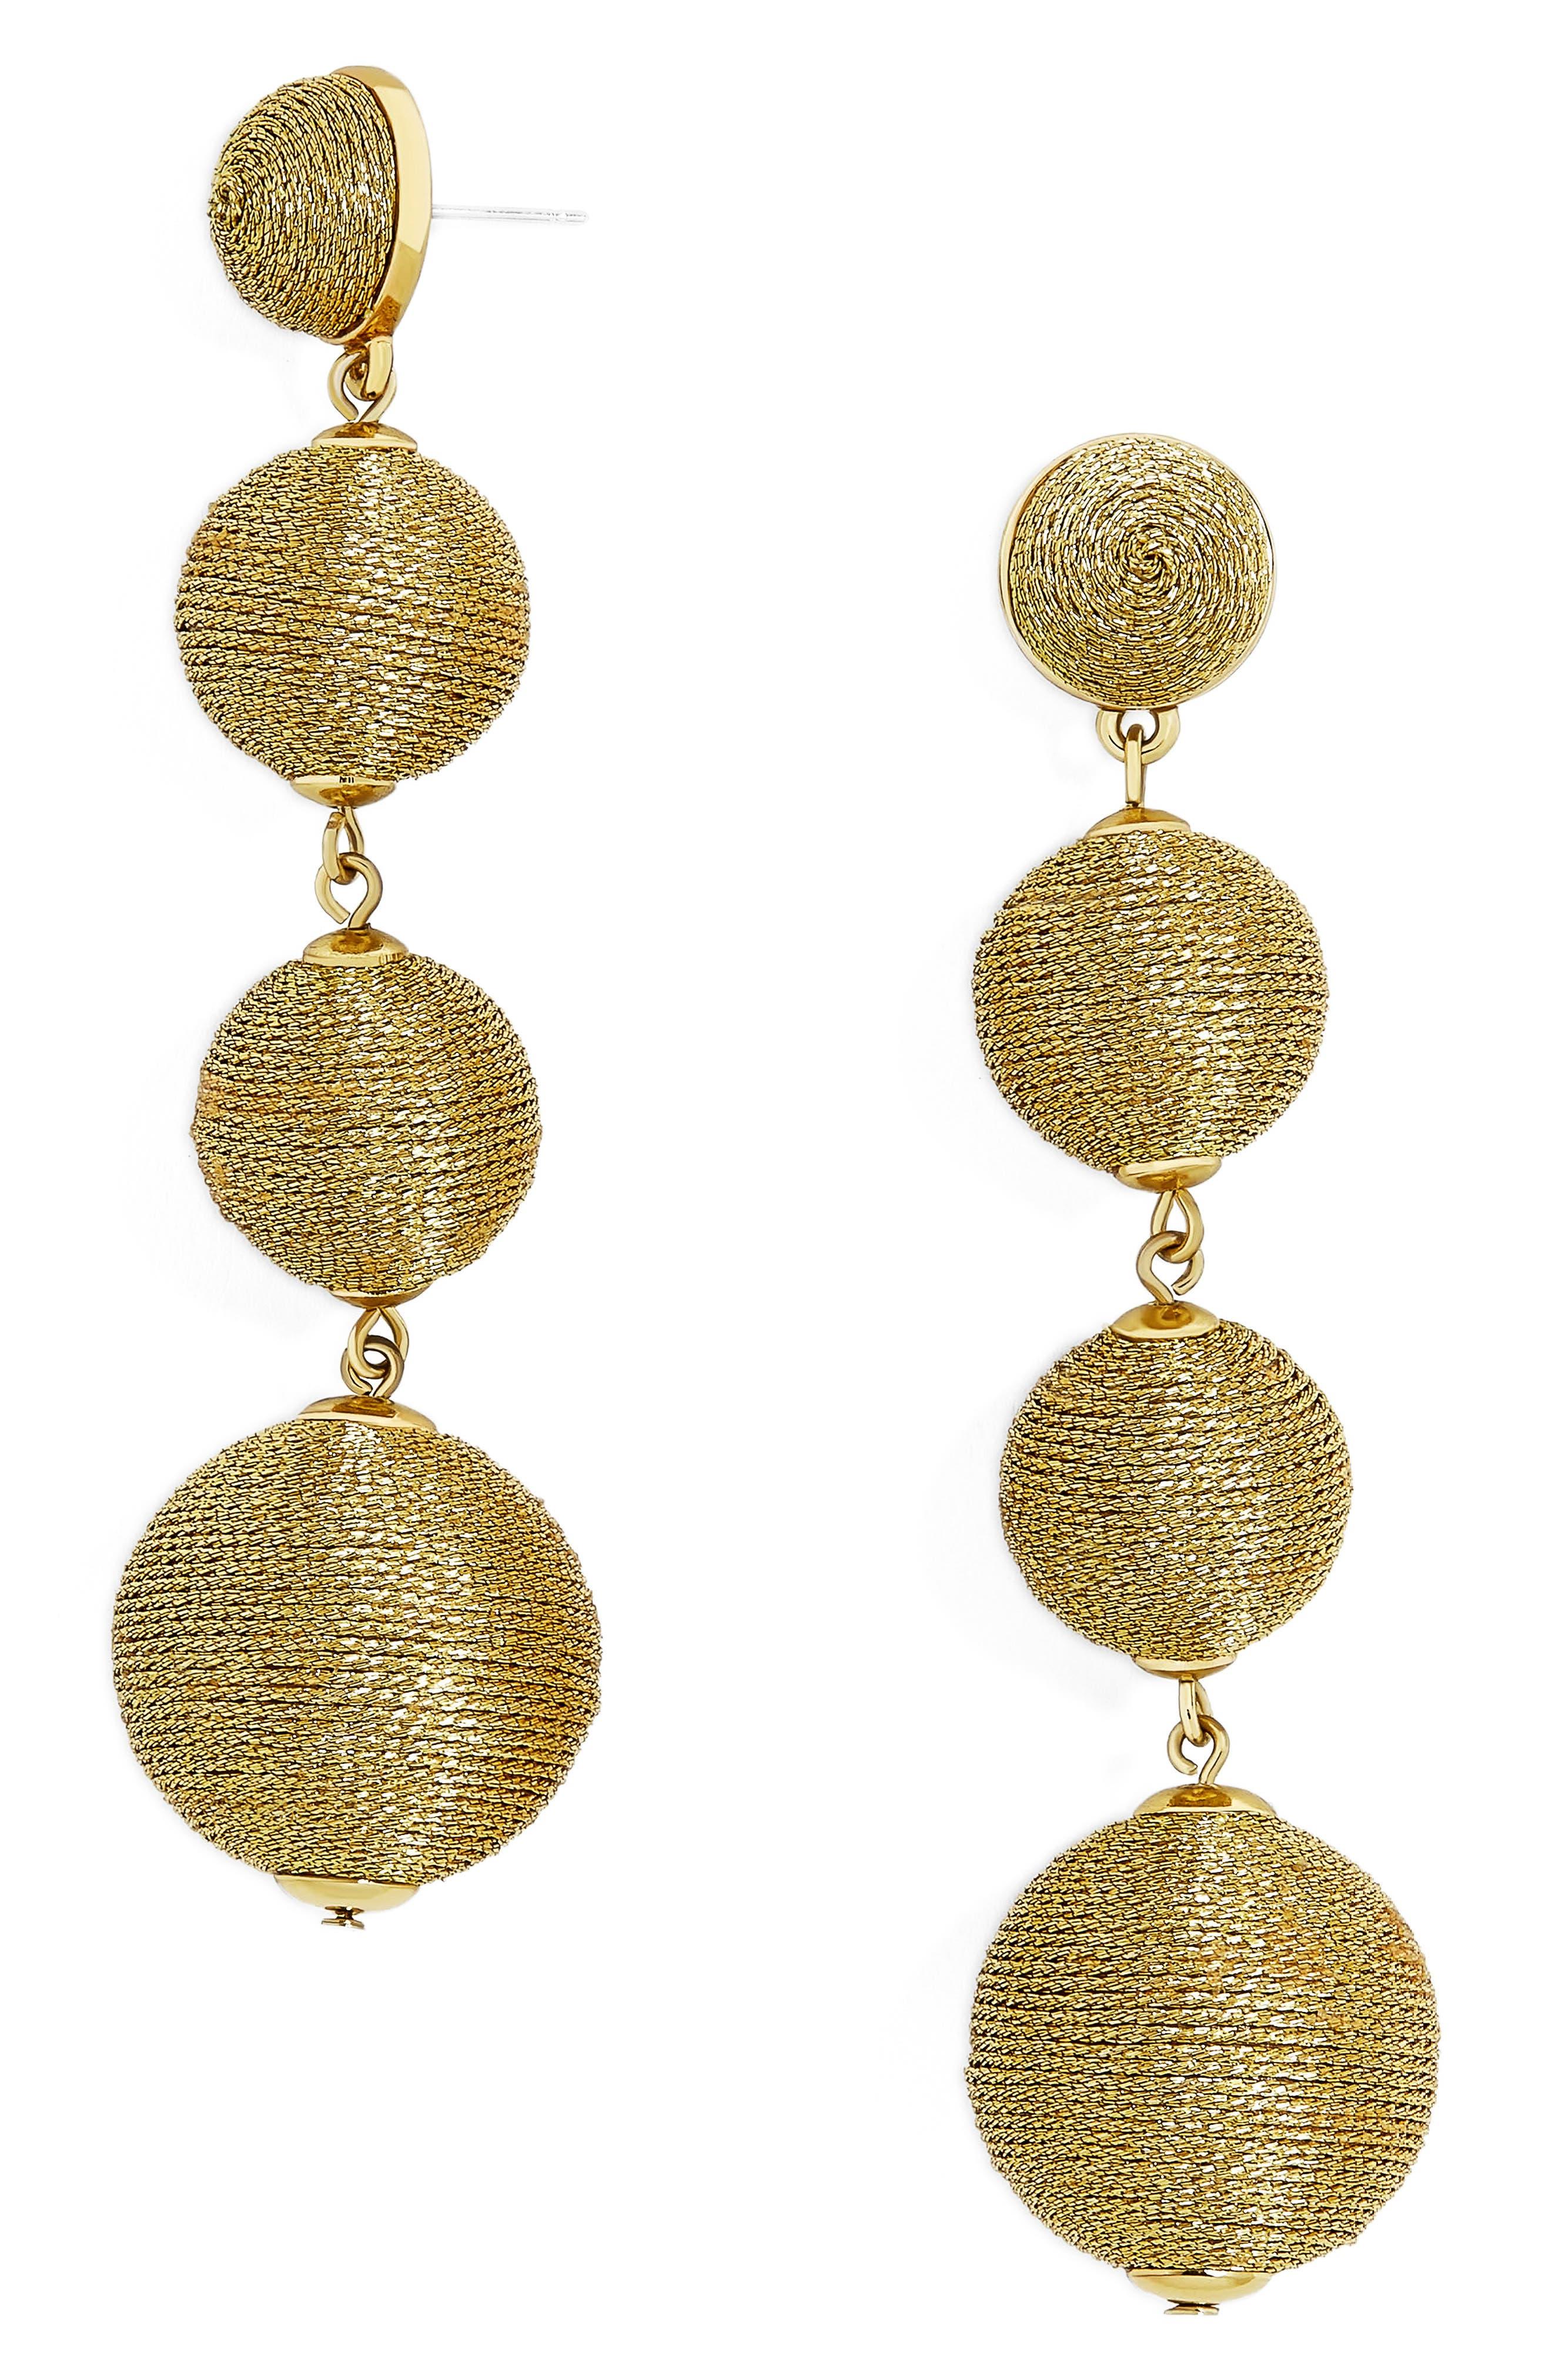 Criselda Ball Shoulder Duster Earrings,                         Main,                         color,